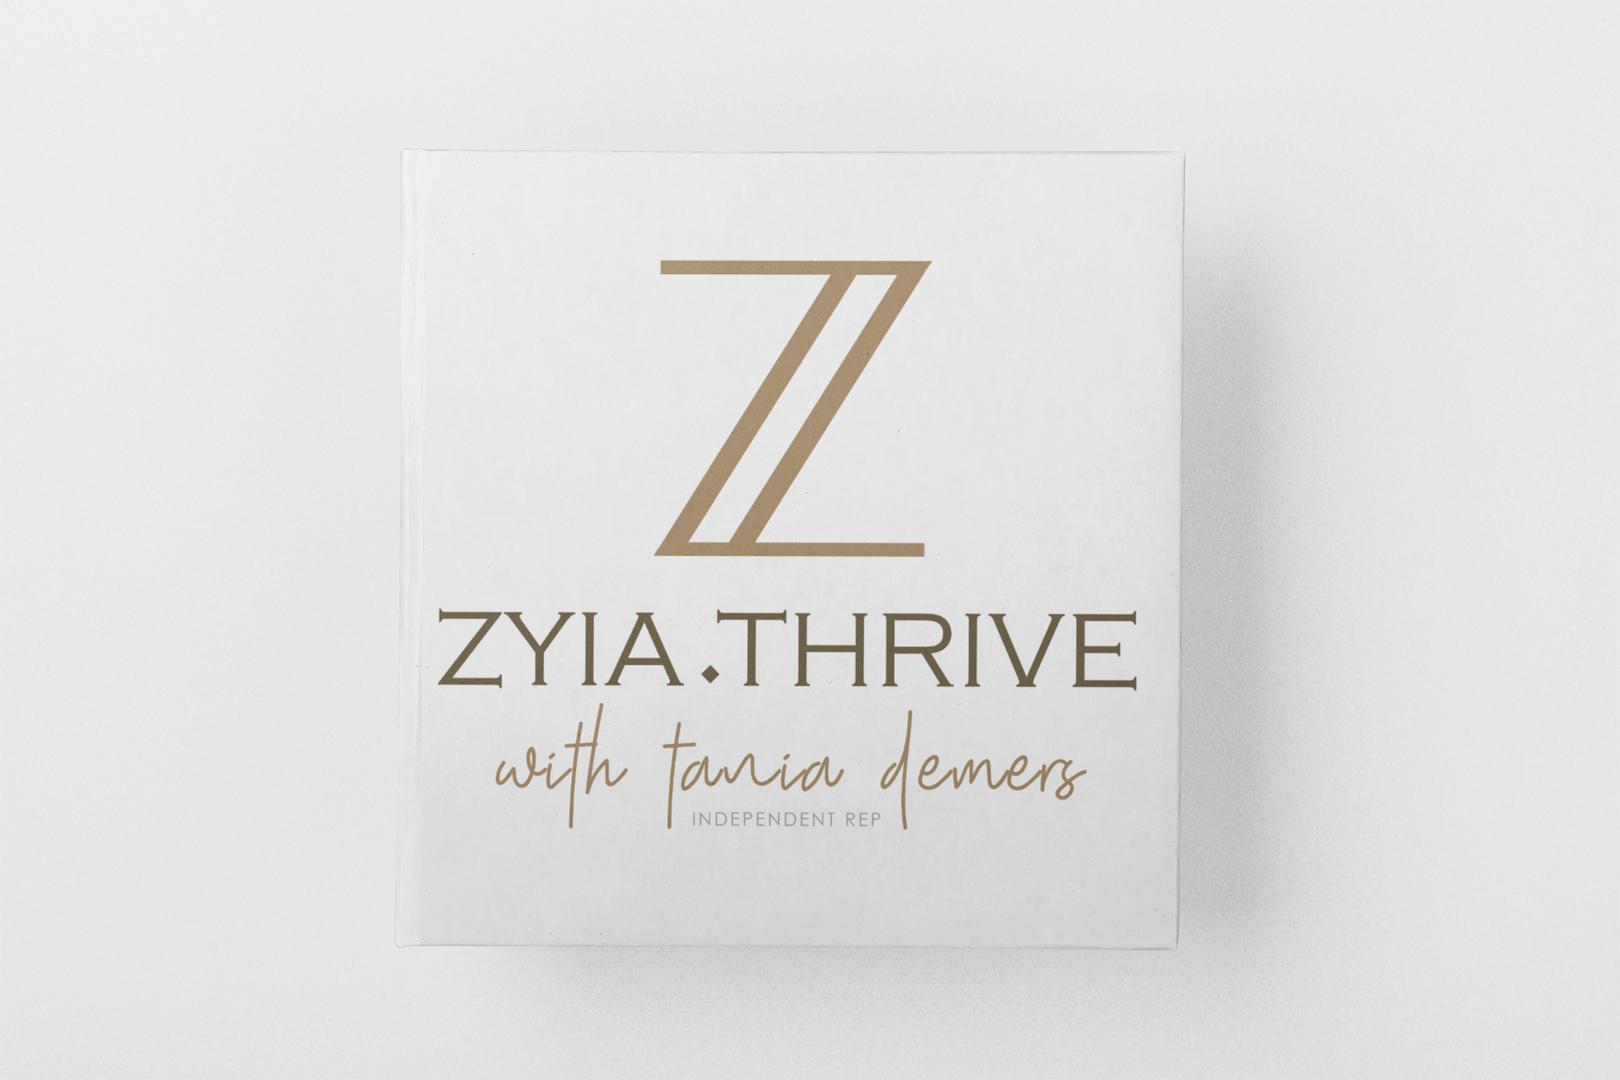 Zyia.Thrive